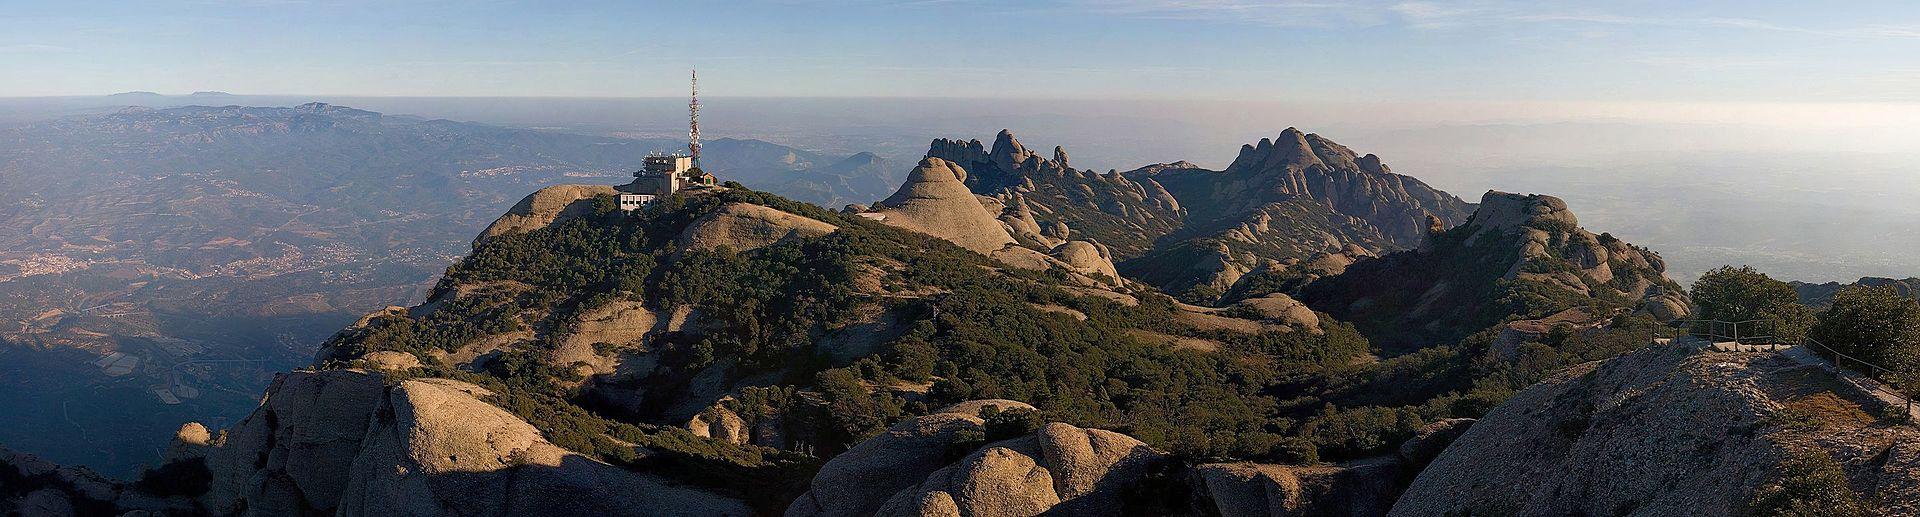 Montserrat_Mountains,_Catalonia,_Spain_-_Jan_2007.jpg